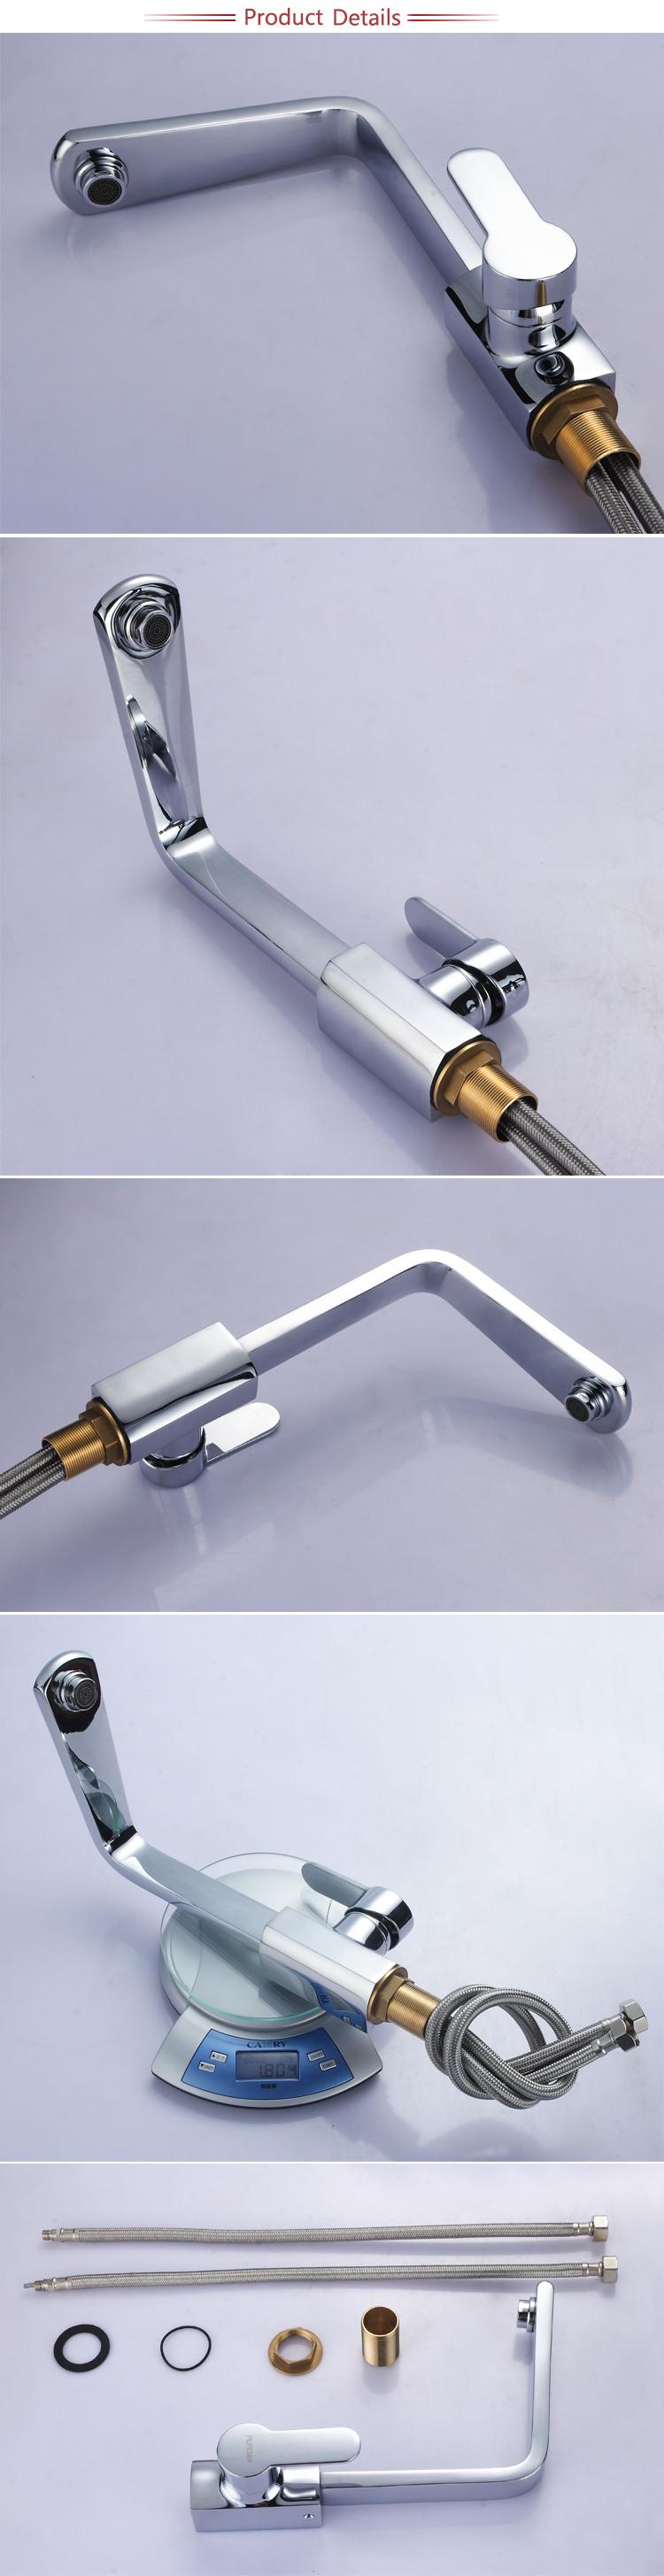 upc 61 9 nsf kitchen faucet buy kitchen faucet brass kitchen faucet